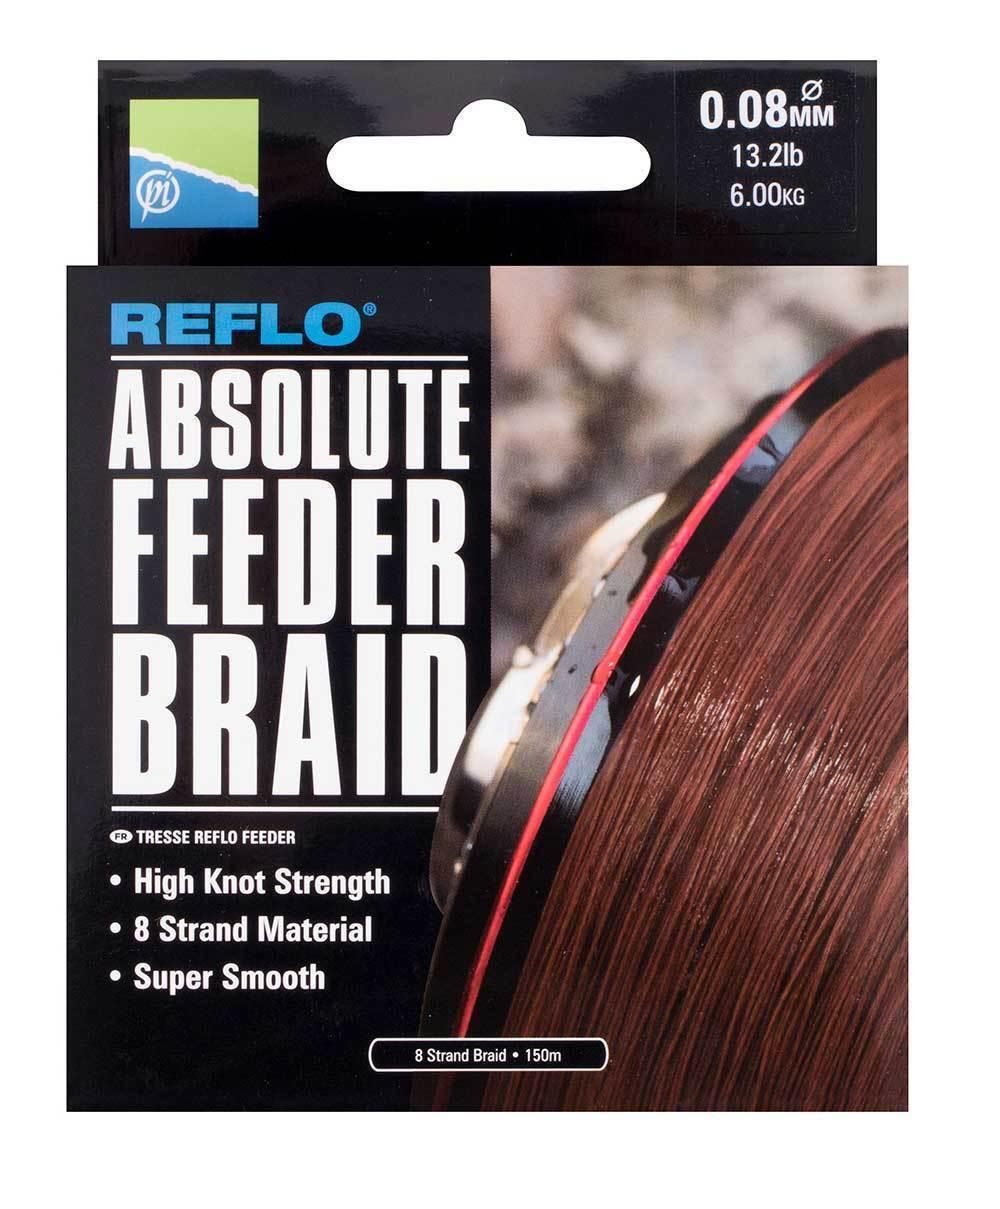 Preston REFLO Absolute Feeder Braid 150m All Diameters 8 strand braid